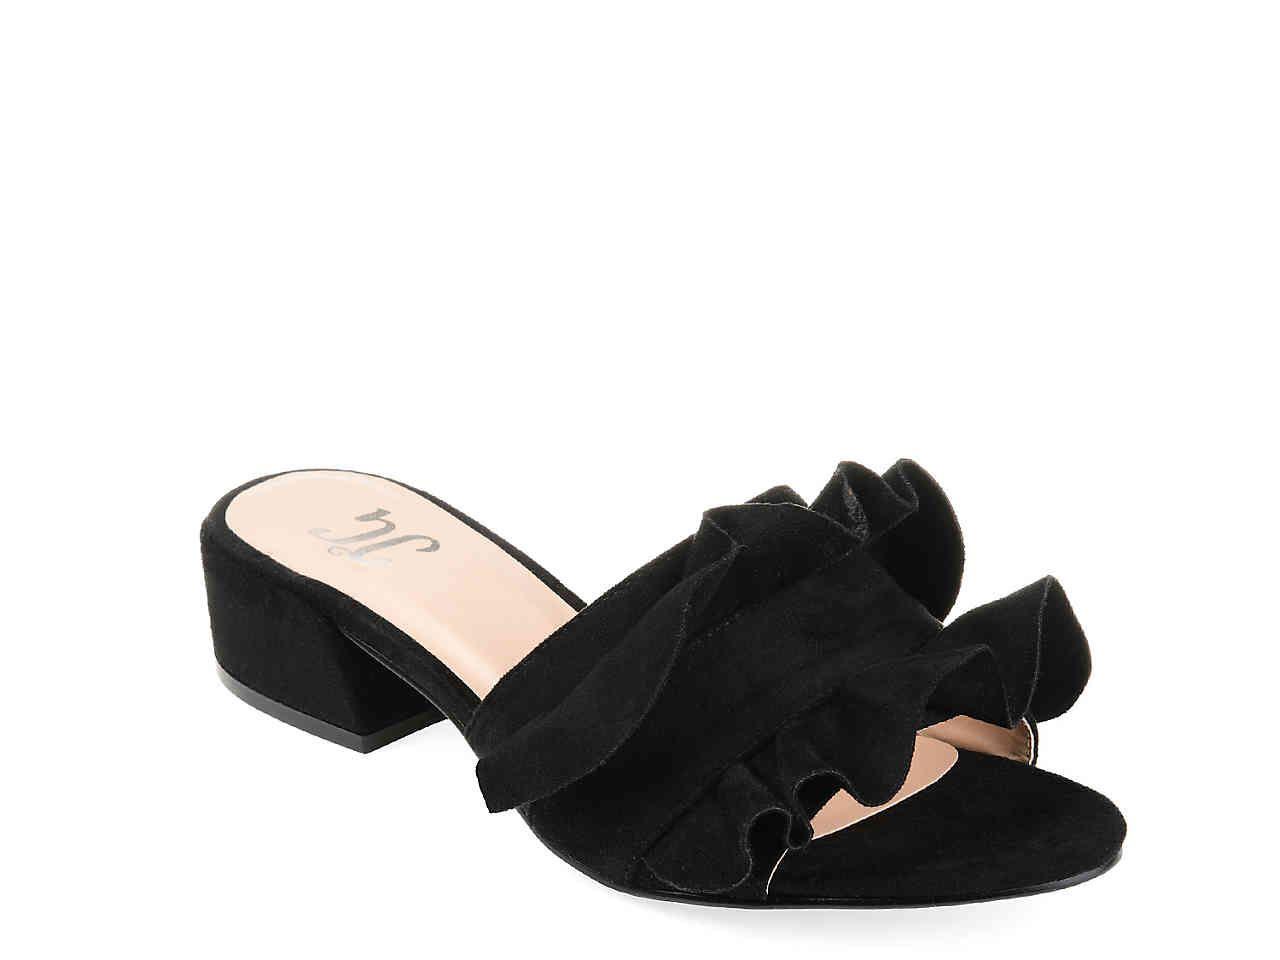 Women Sabica Sandal Black Leather Sandals Sandals Boots